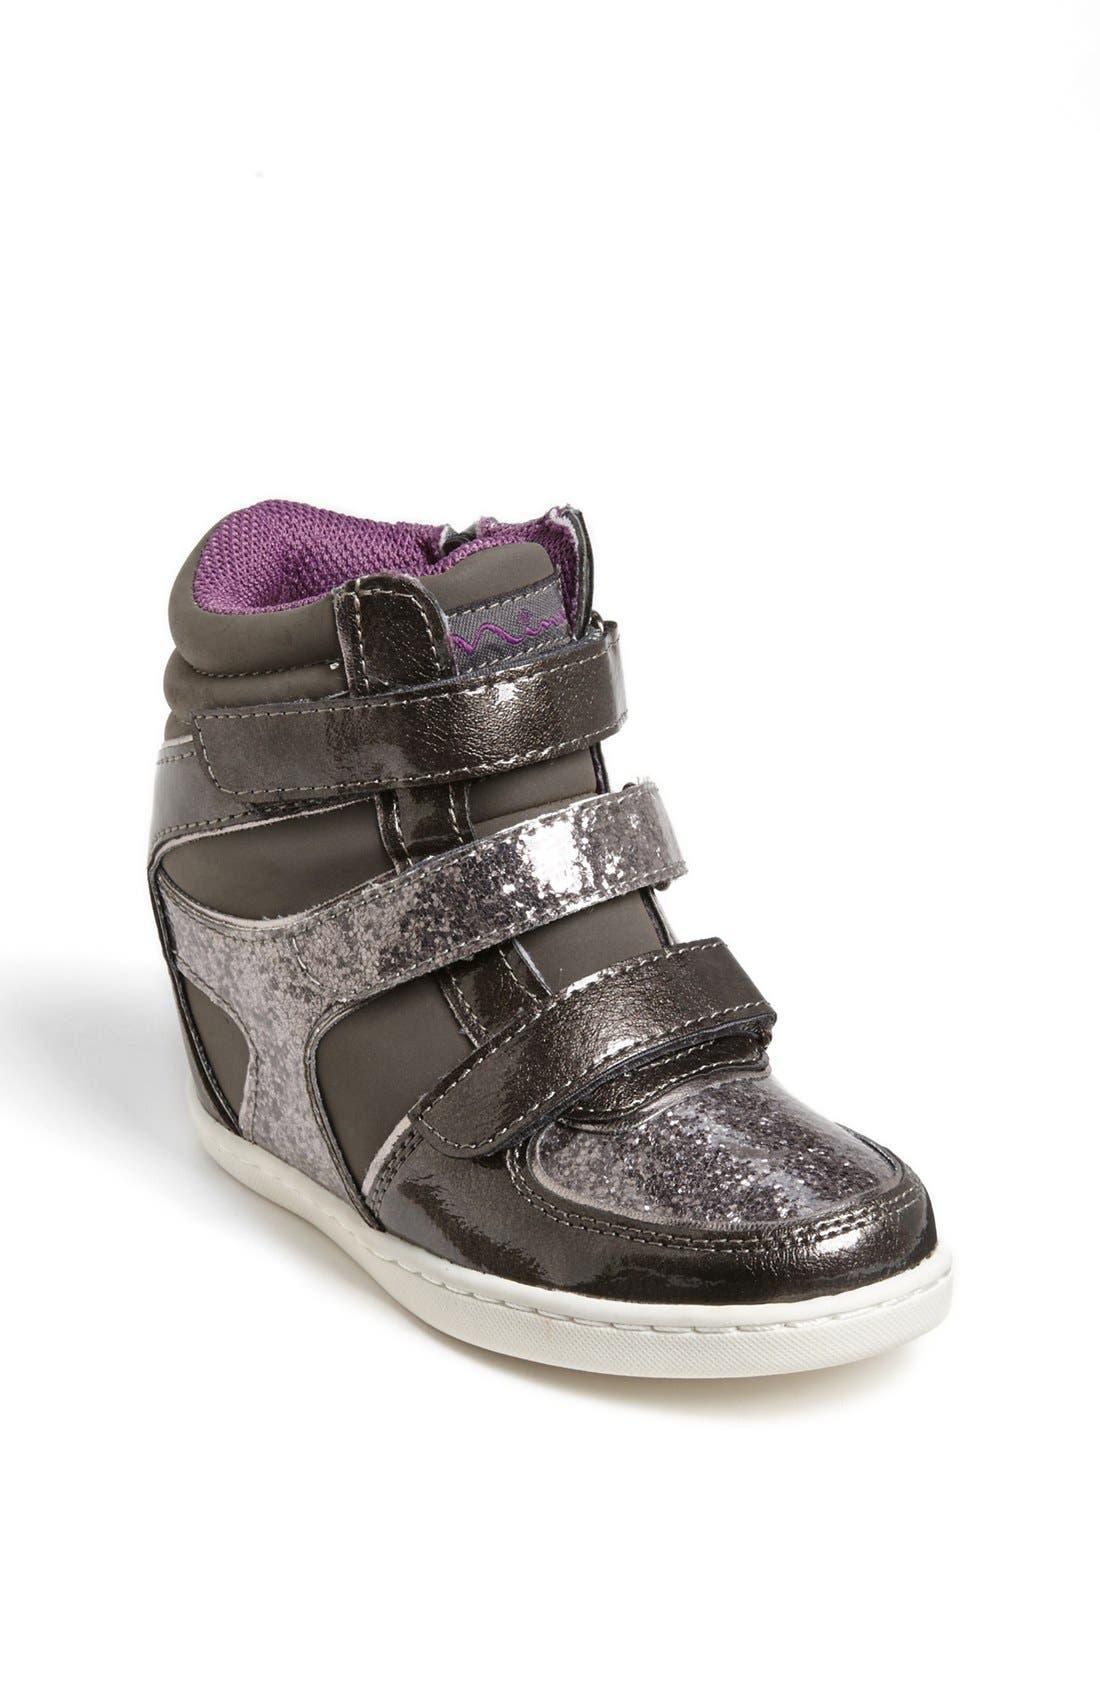 Alternate Image 1 Selected - Nina 'Tally' Sneaker (Little Kid & Big Kid)